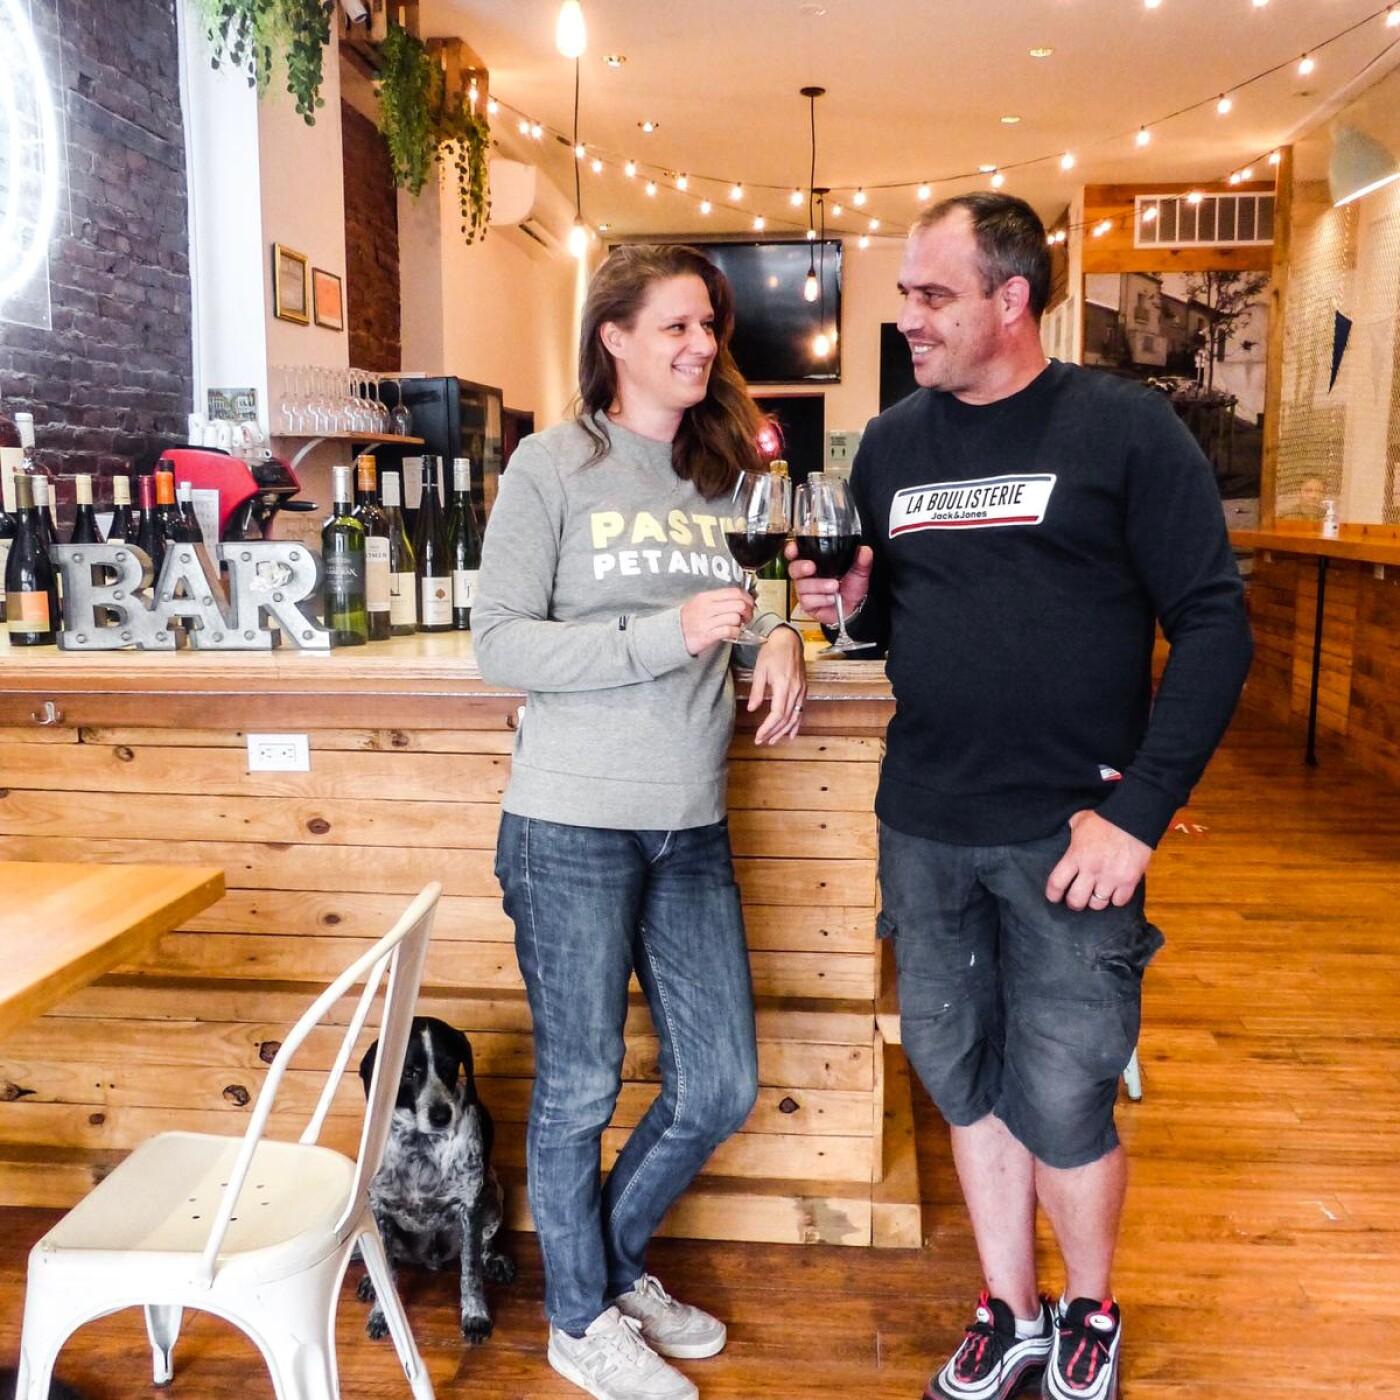 Alexandra ouvre son bar a vin a NewYork, en partenariat avec LePetitJournal NY - 07 04 21 - StereoChic Radio